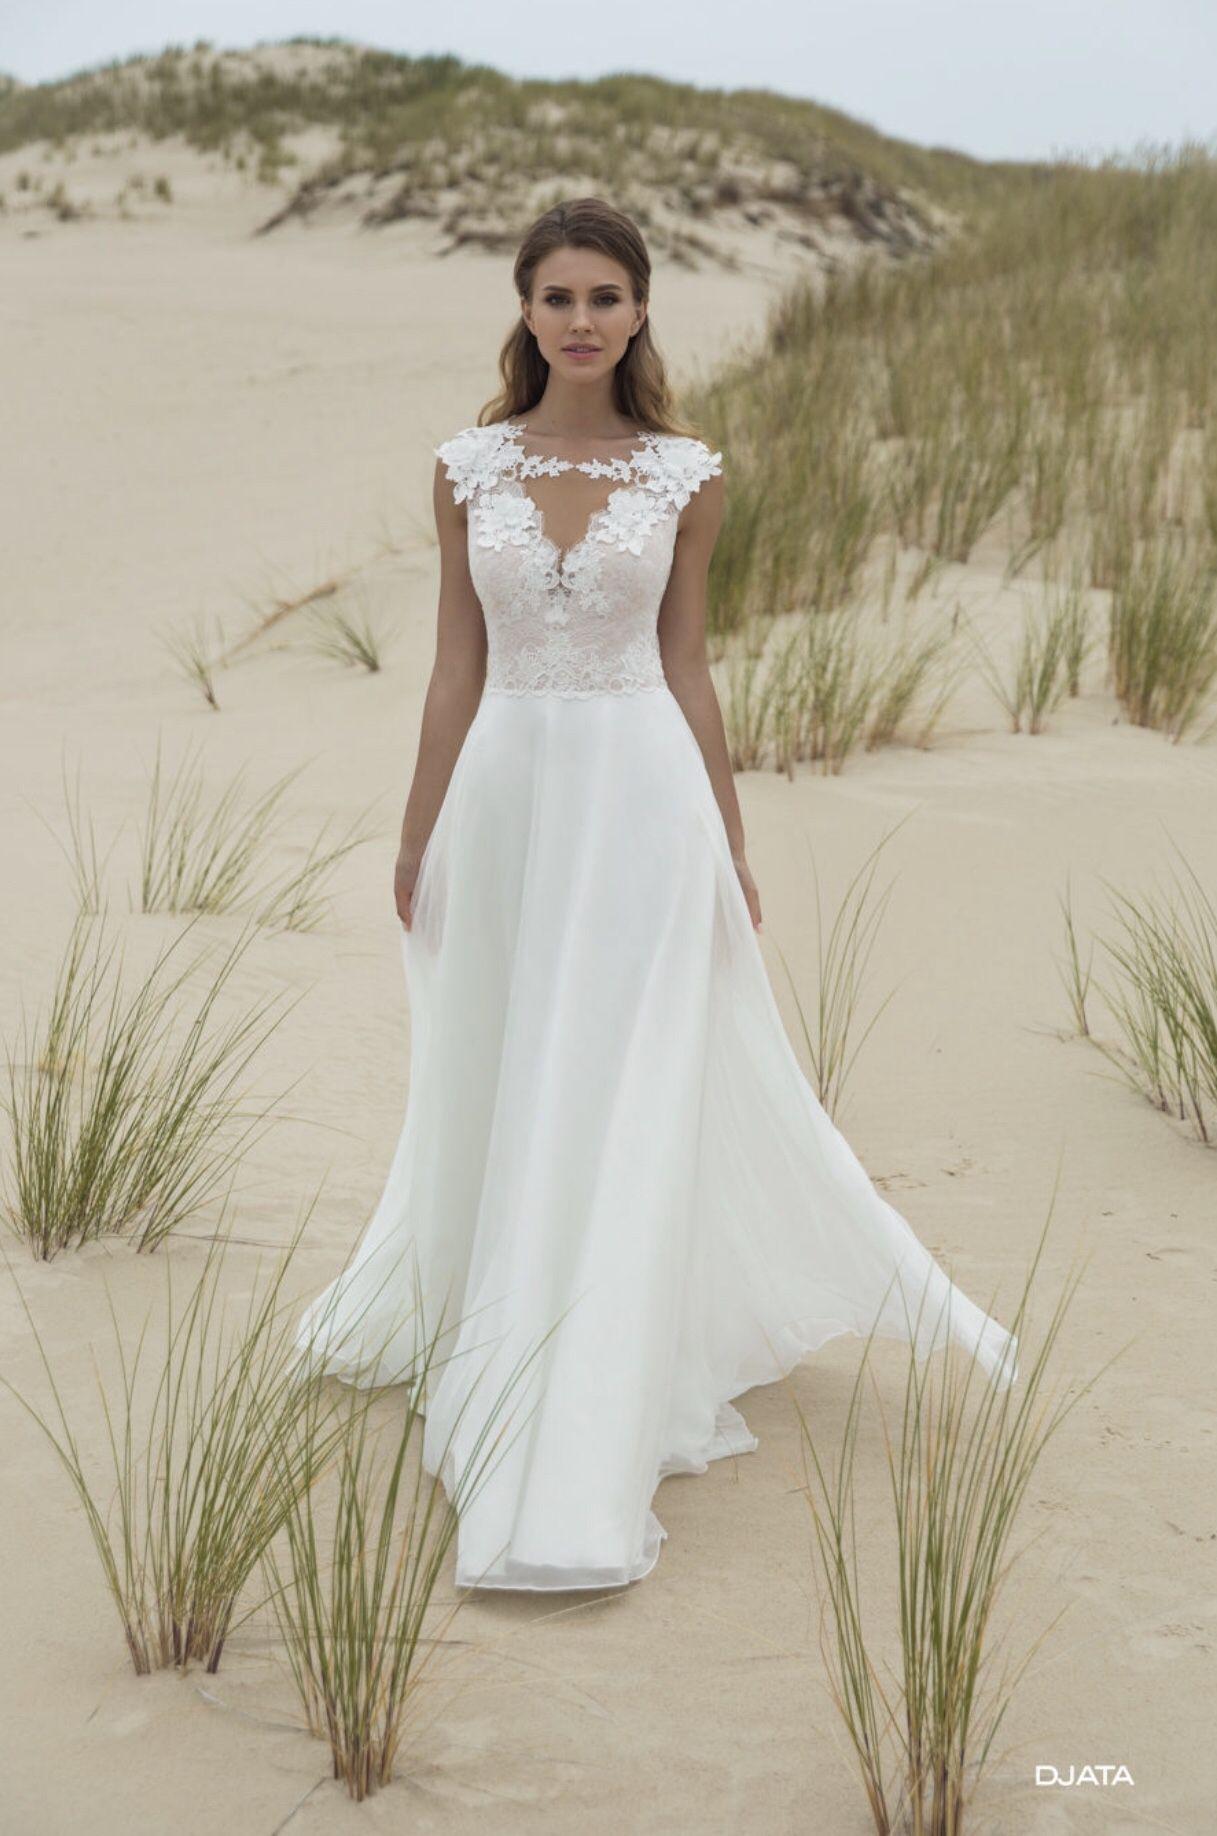 Le Rina Brautkleid Djata Hochzeitskleid Hochzeitskleid Hochzeitskleider Vintage Brautmode